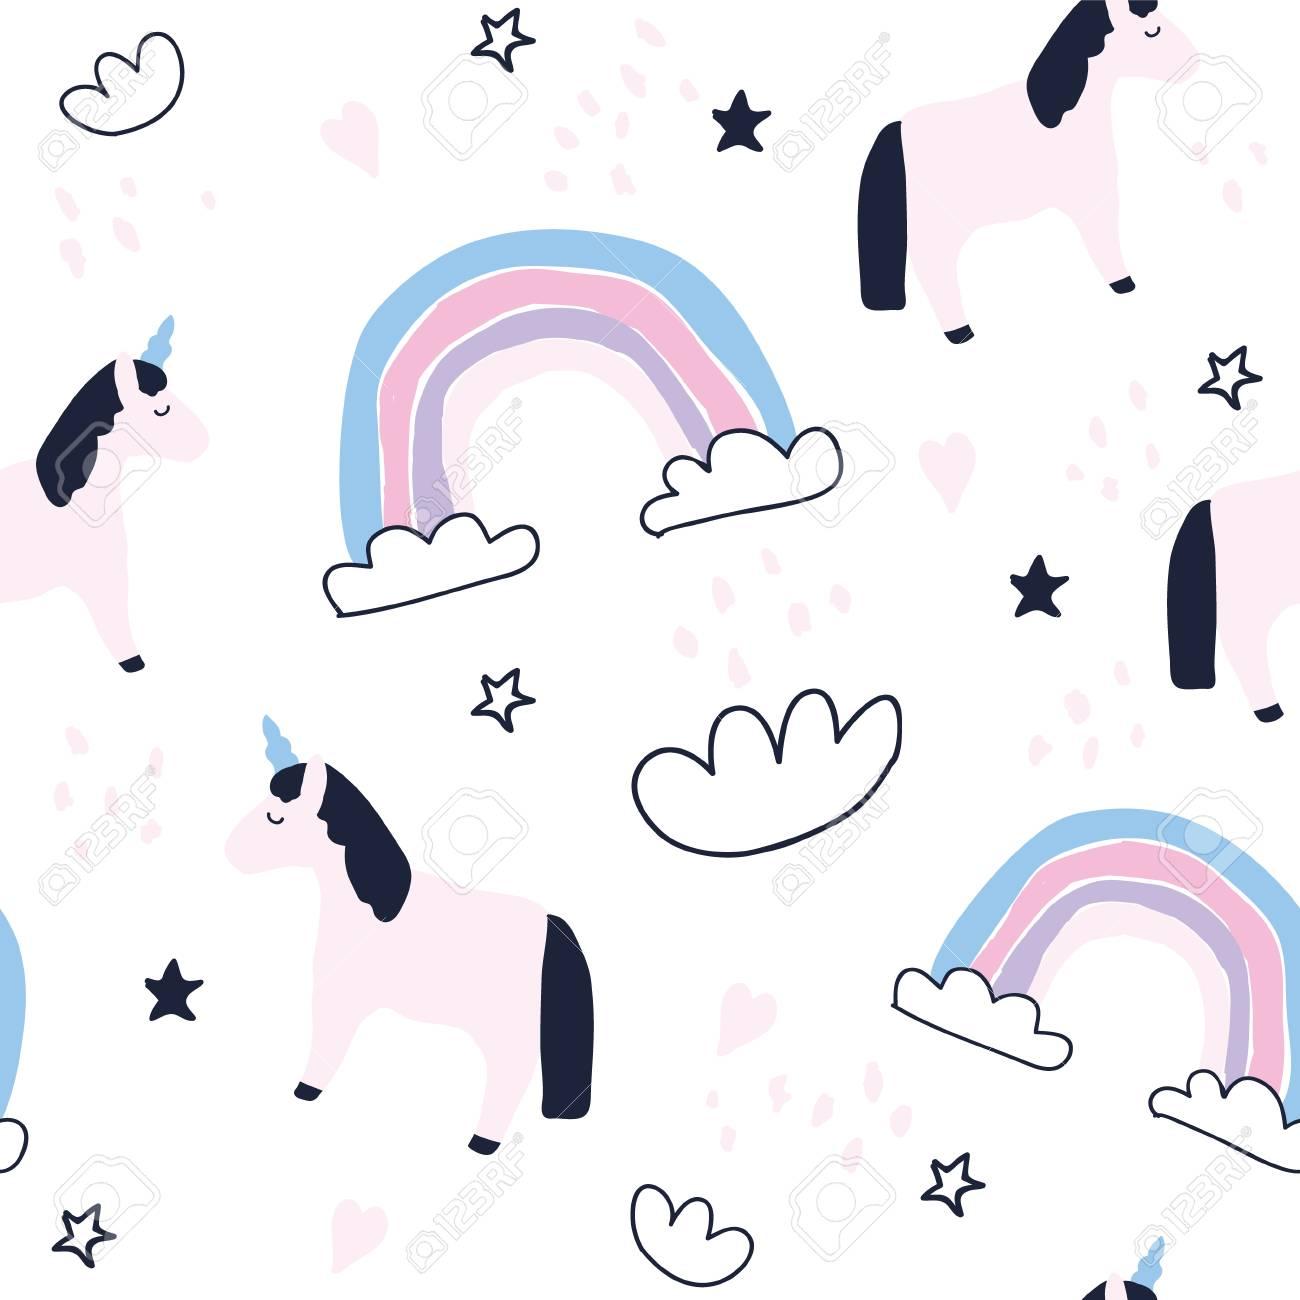 Free download Unicorn Wallpaper 8